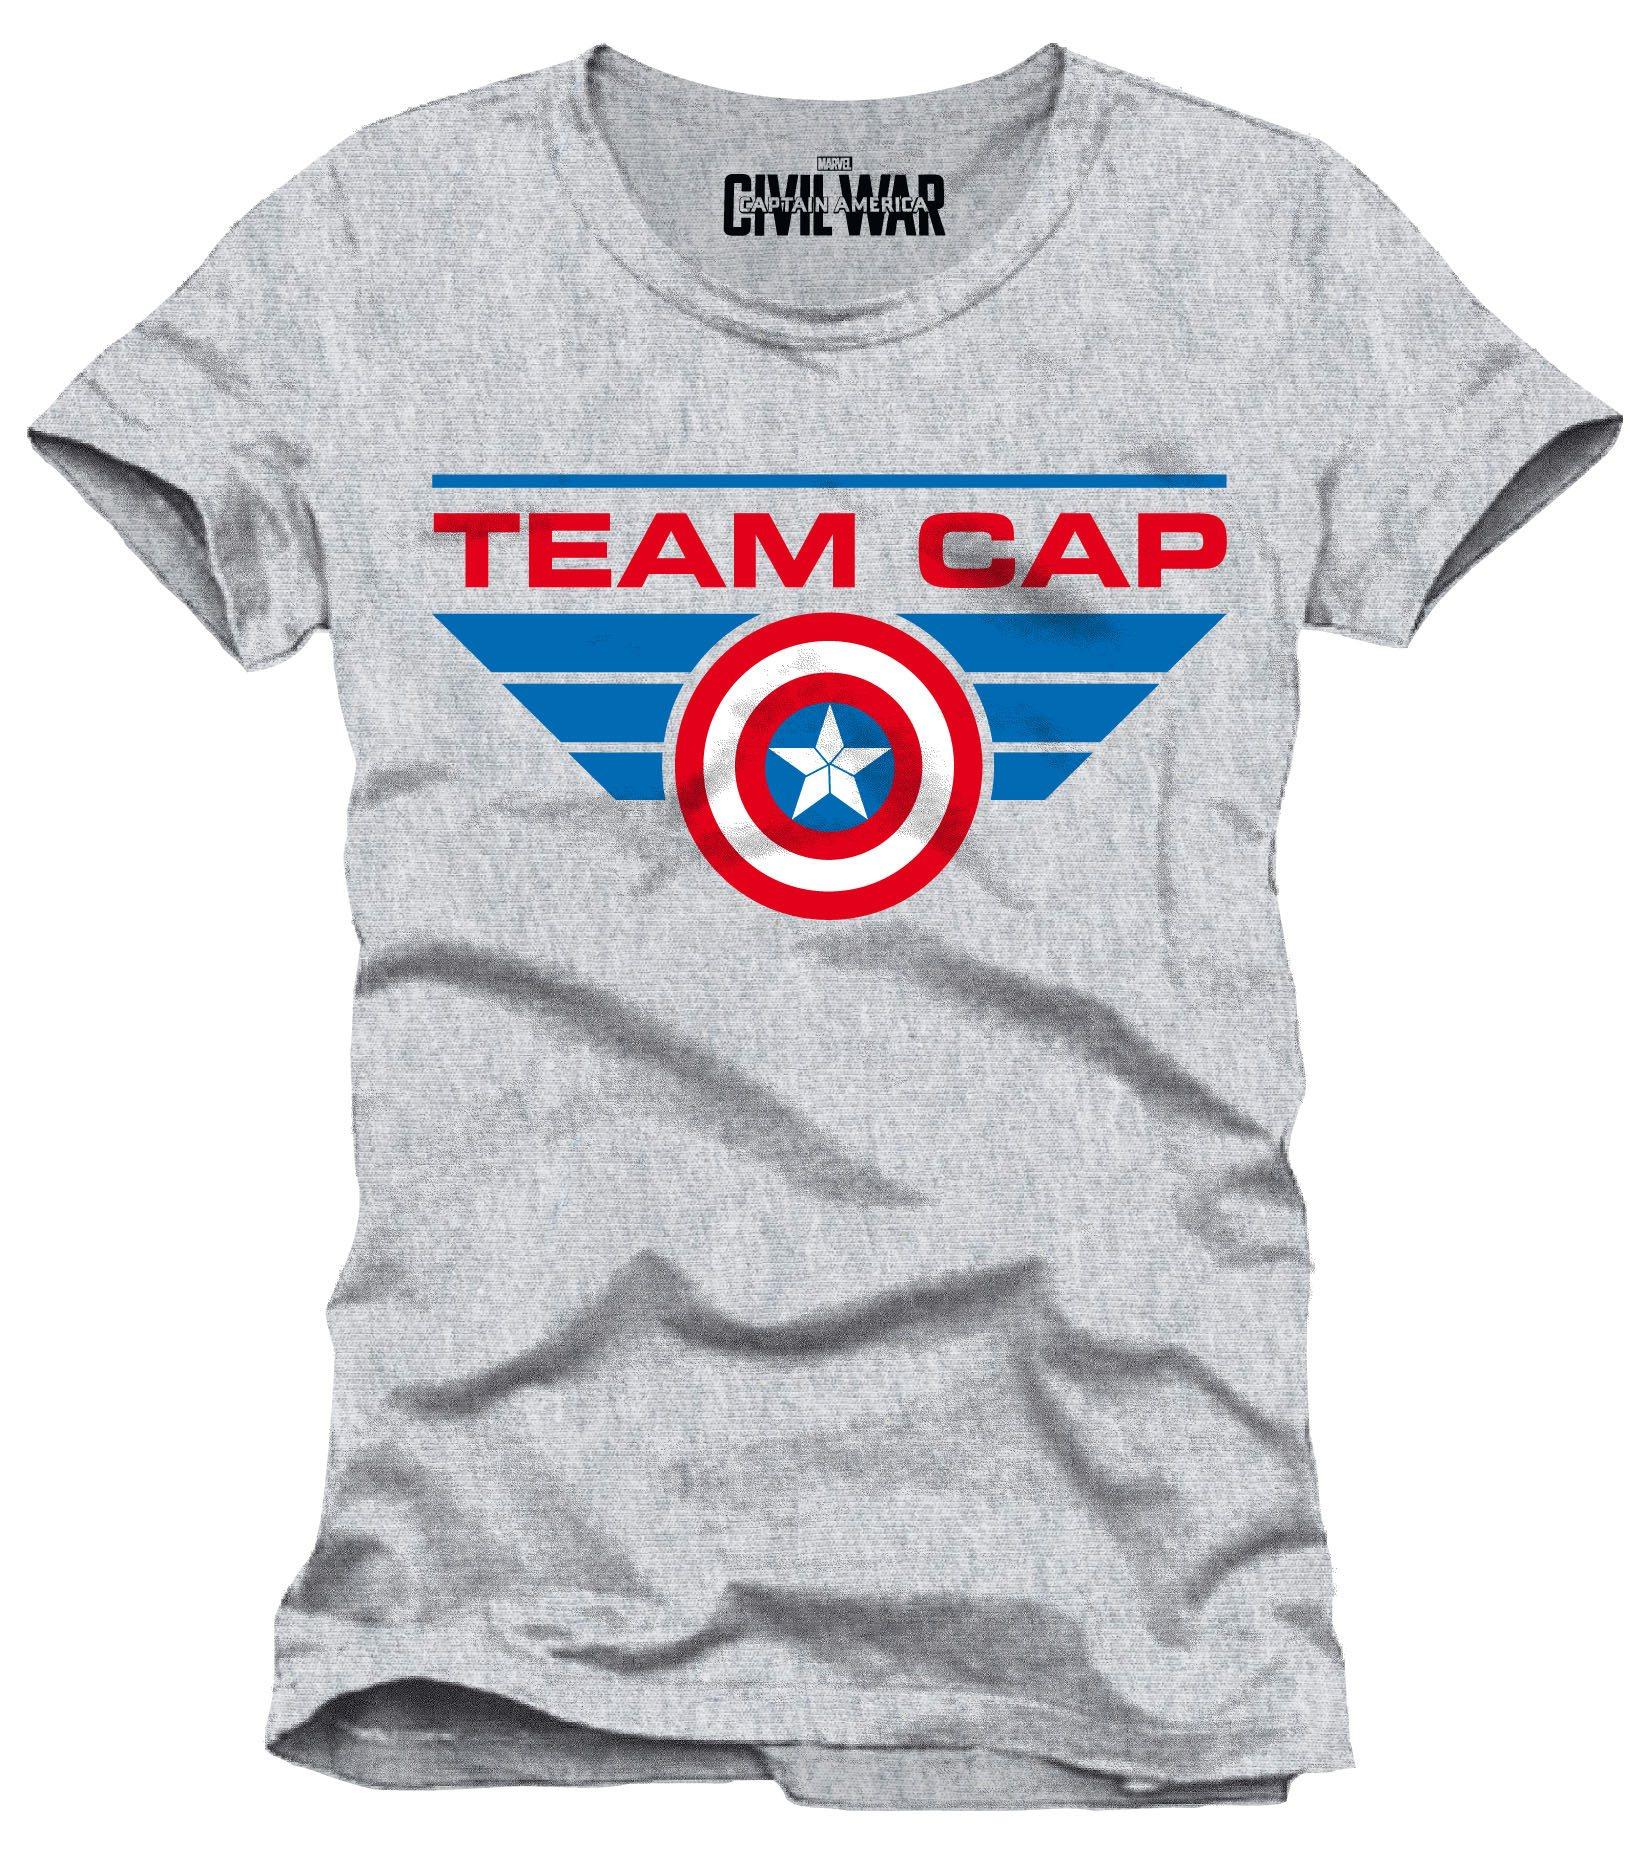 Captain America Civil War T-Shirt Team Cap Size M